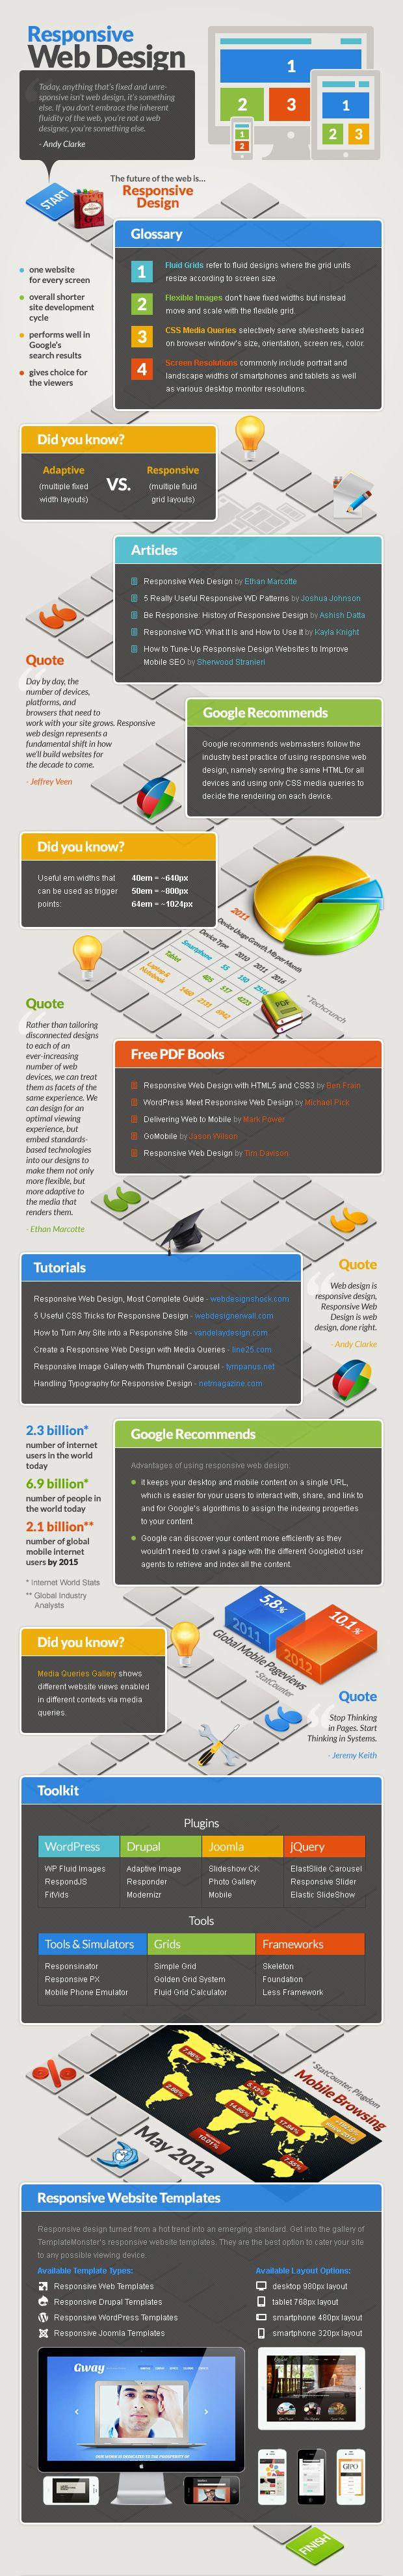 Responsive web design is different to adaptive #Infographics www.socialmediamamma.com